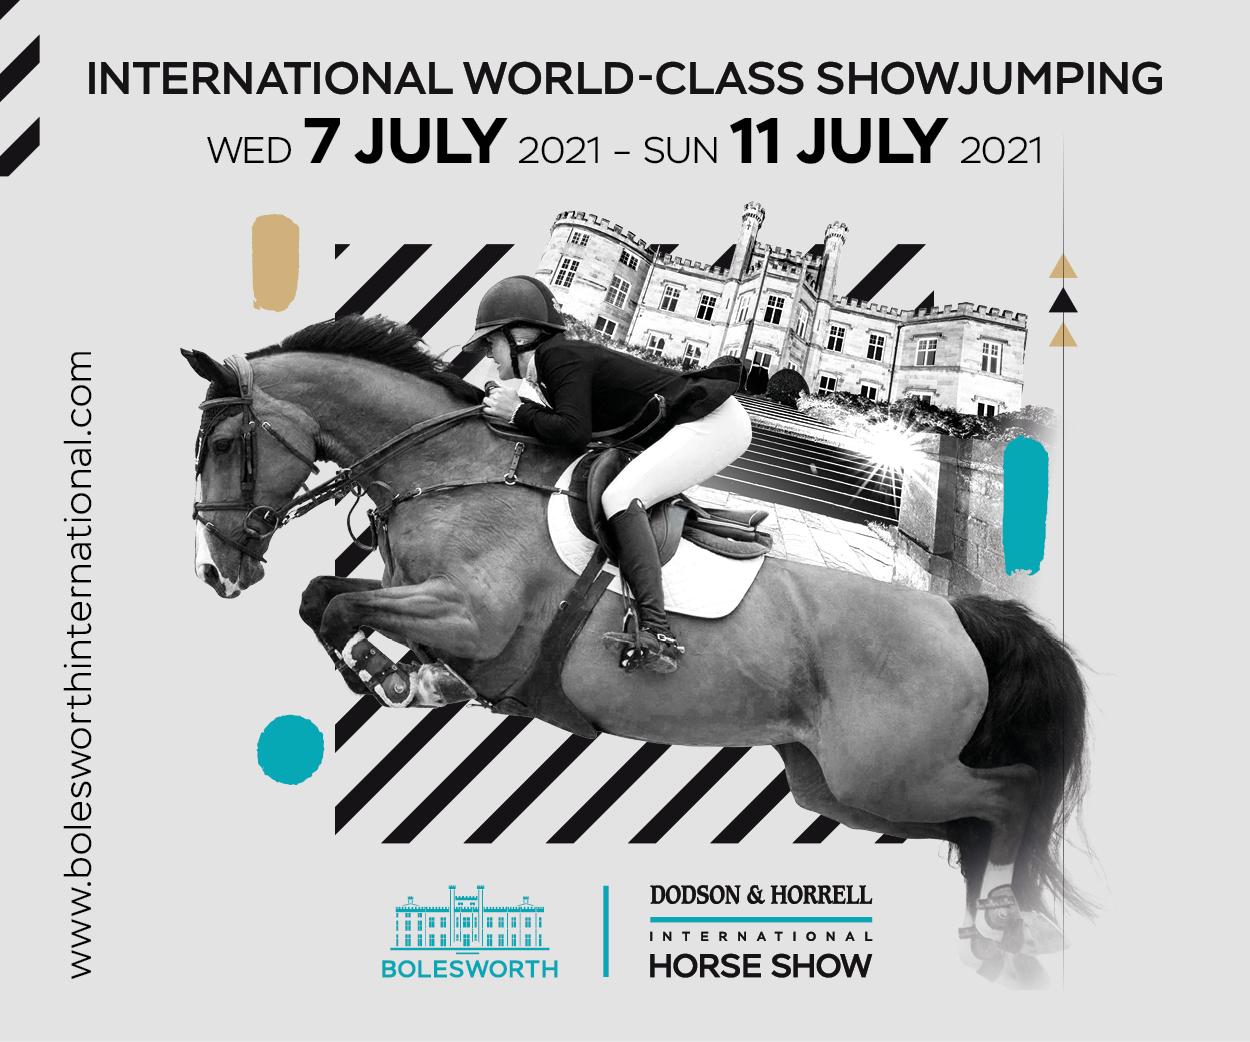 Bolesworth 2021 (Merseyside Horse)